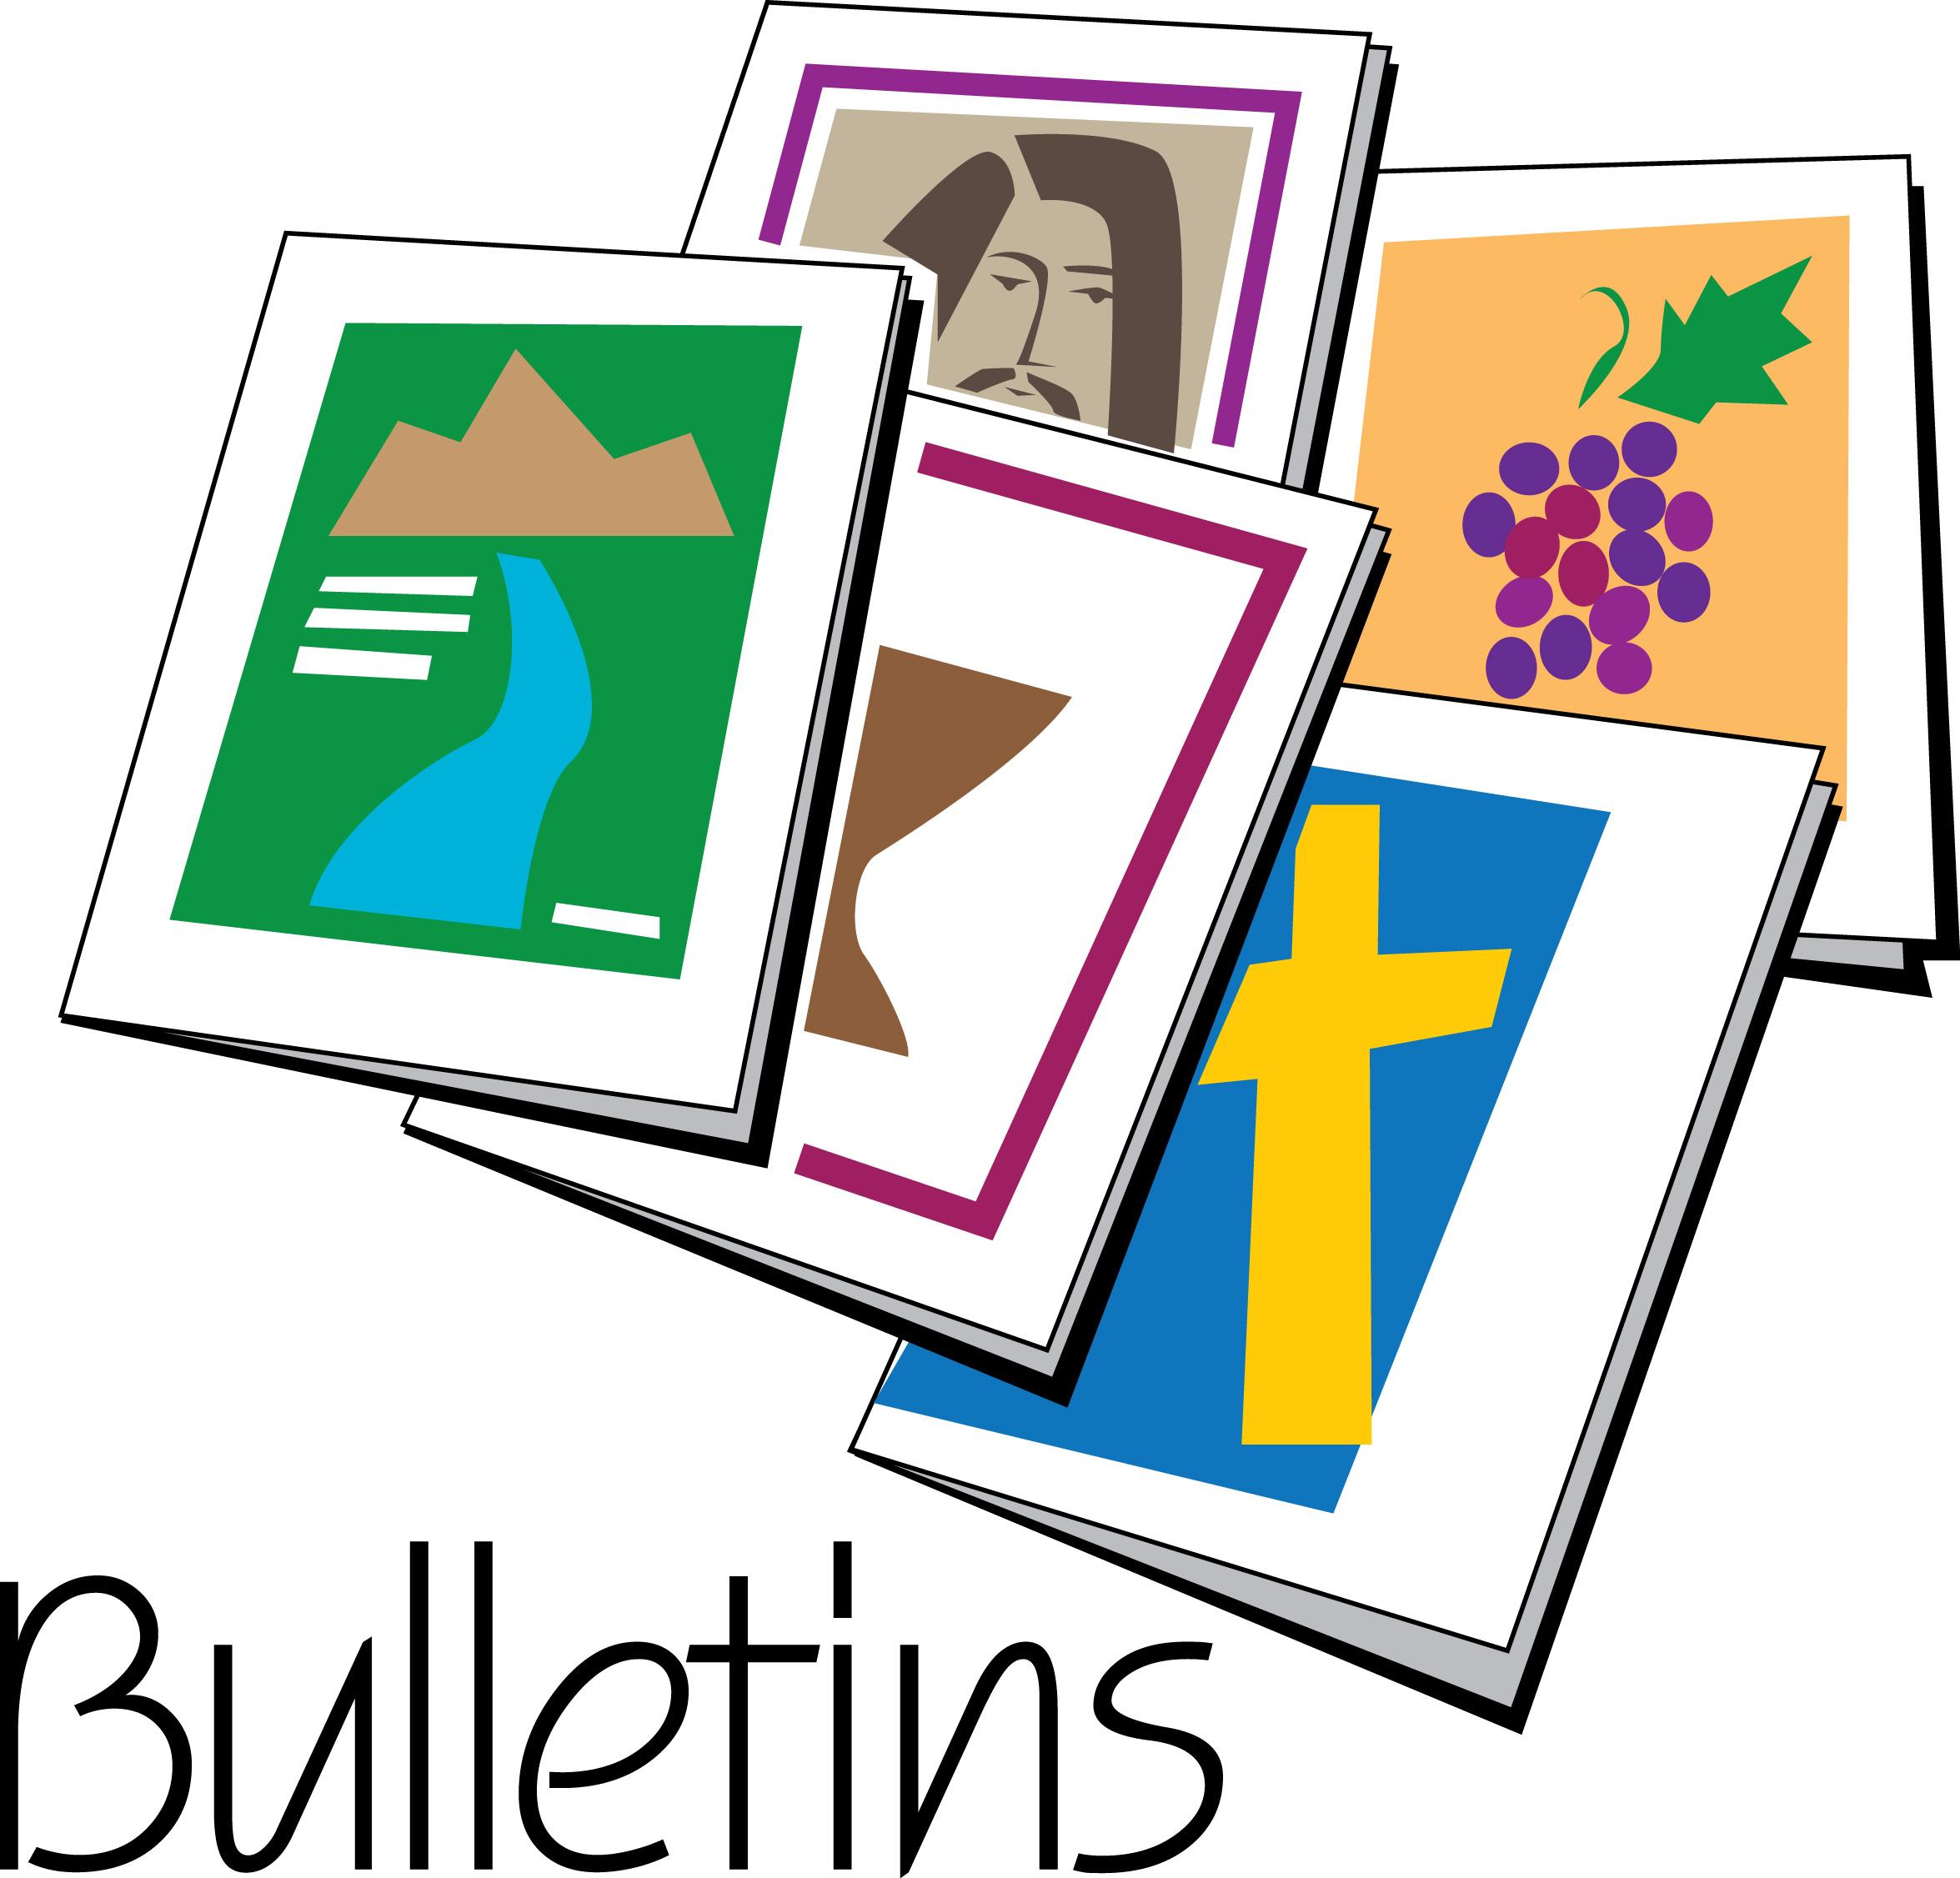 Church Bulletin Clip Art Clipart Best-Church Bulletin Clip Art Clipart Best-1